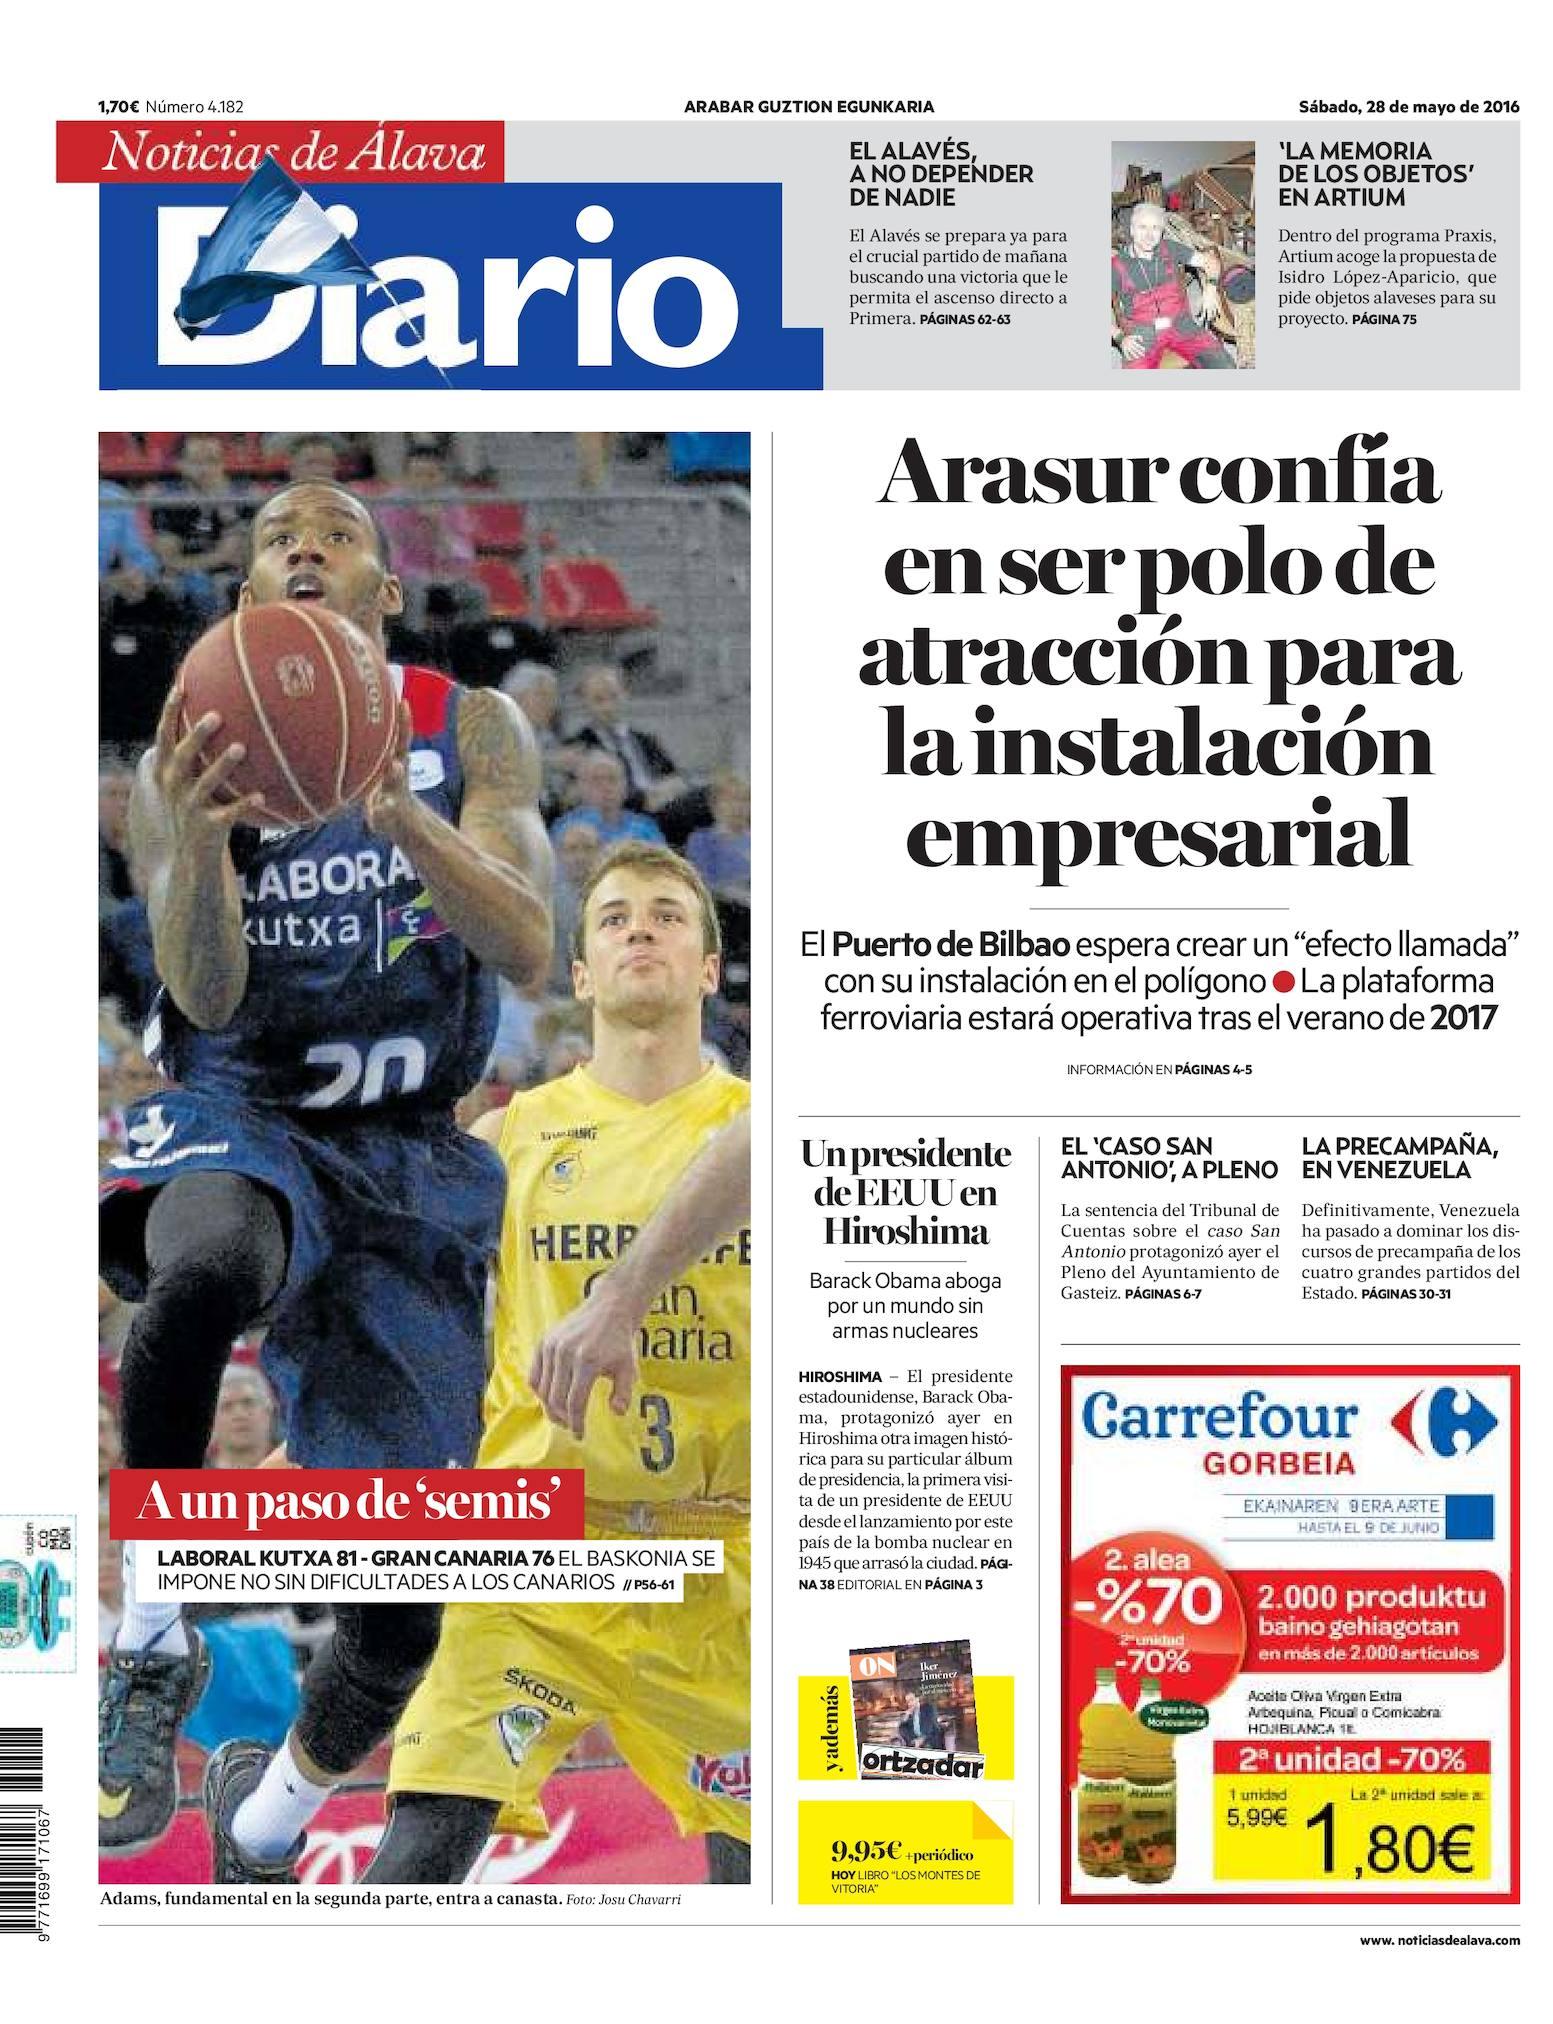 ce7c95b4fa976 Calaméo - Diario de Noticias de Álava 20160528